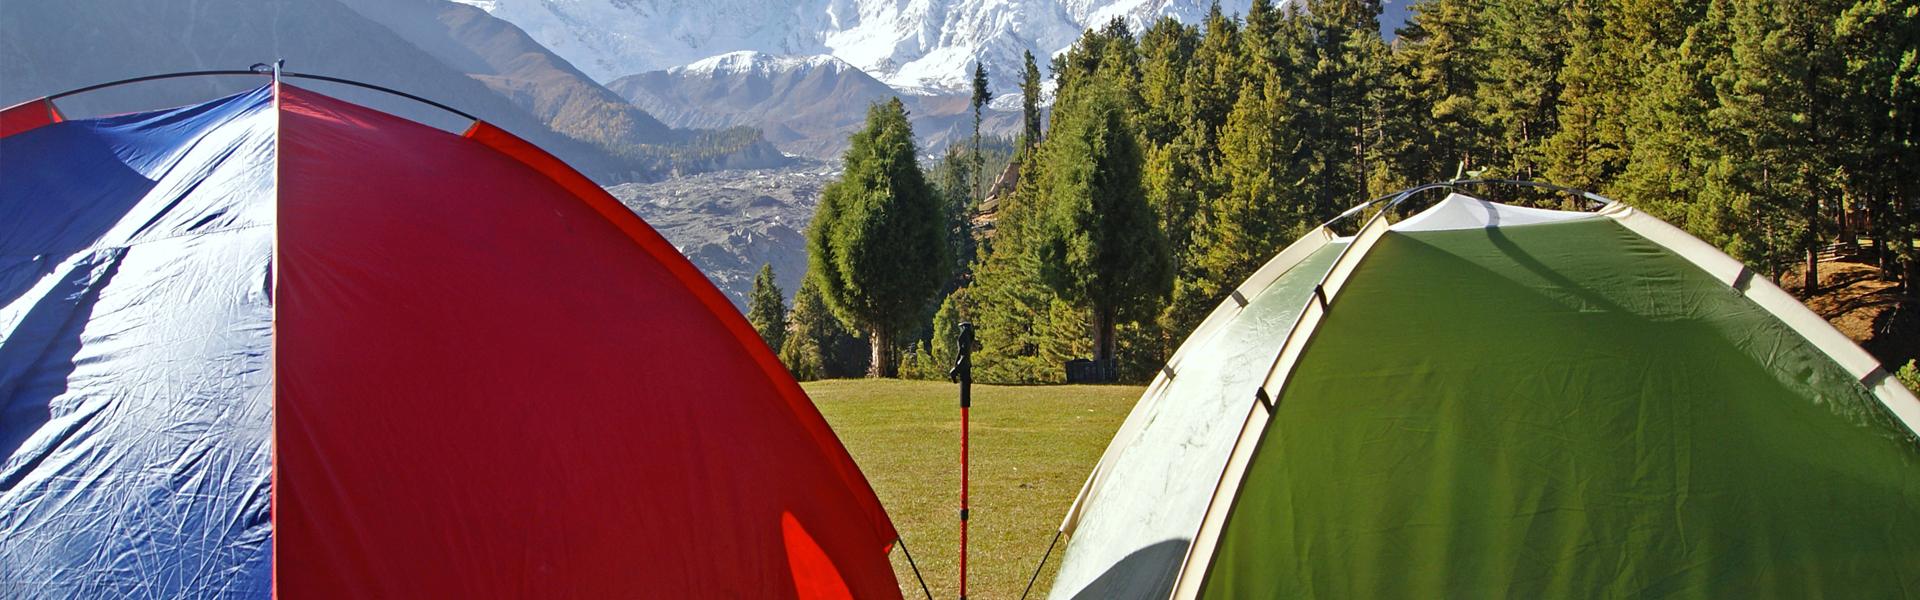 mejores-campings-leon